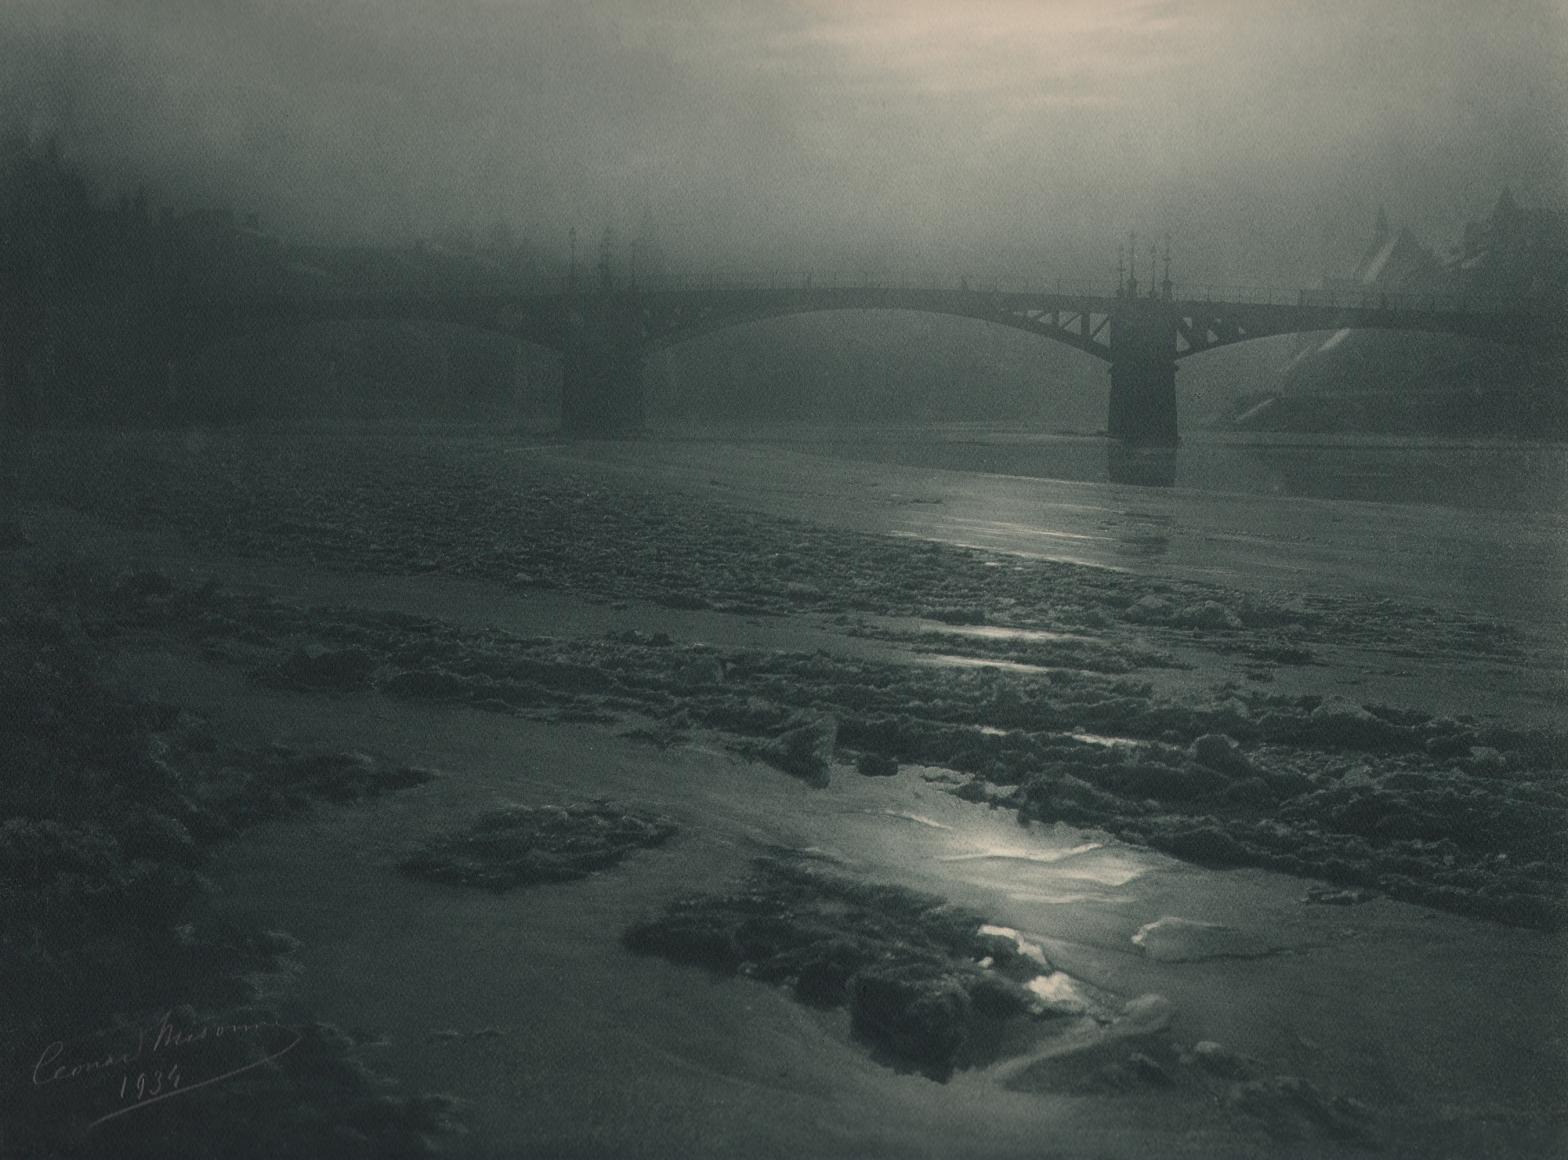 12. Léonard Misonne, Hiver à Dinant, 1934. Partially frozen body of water running under a bridge in hazy light. Gray/green-toned print.